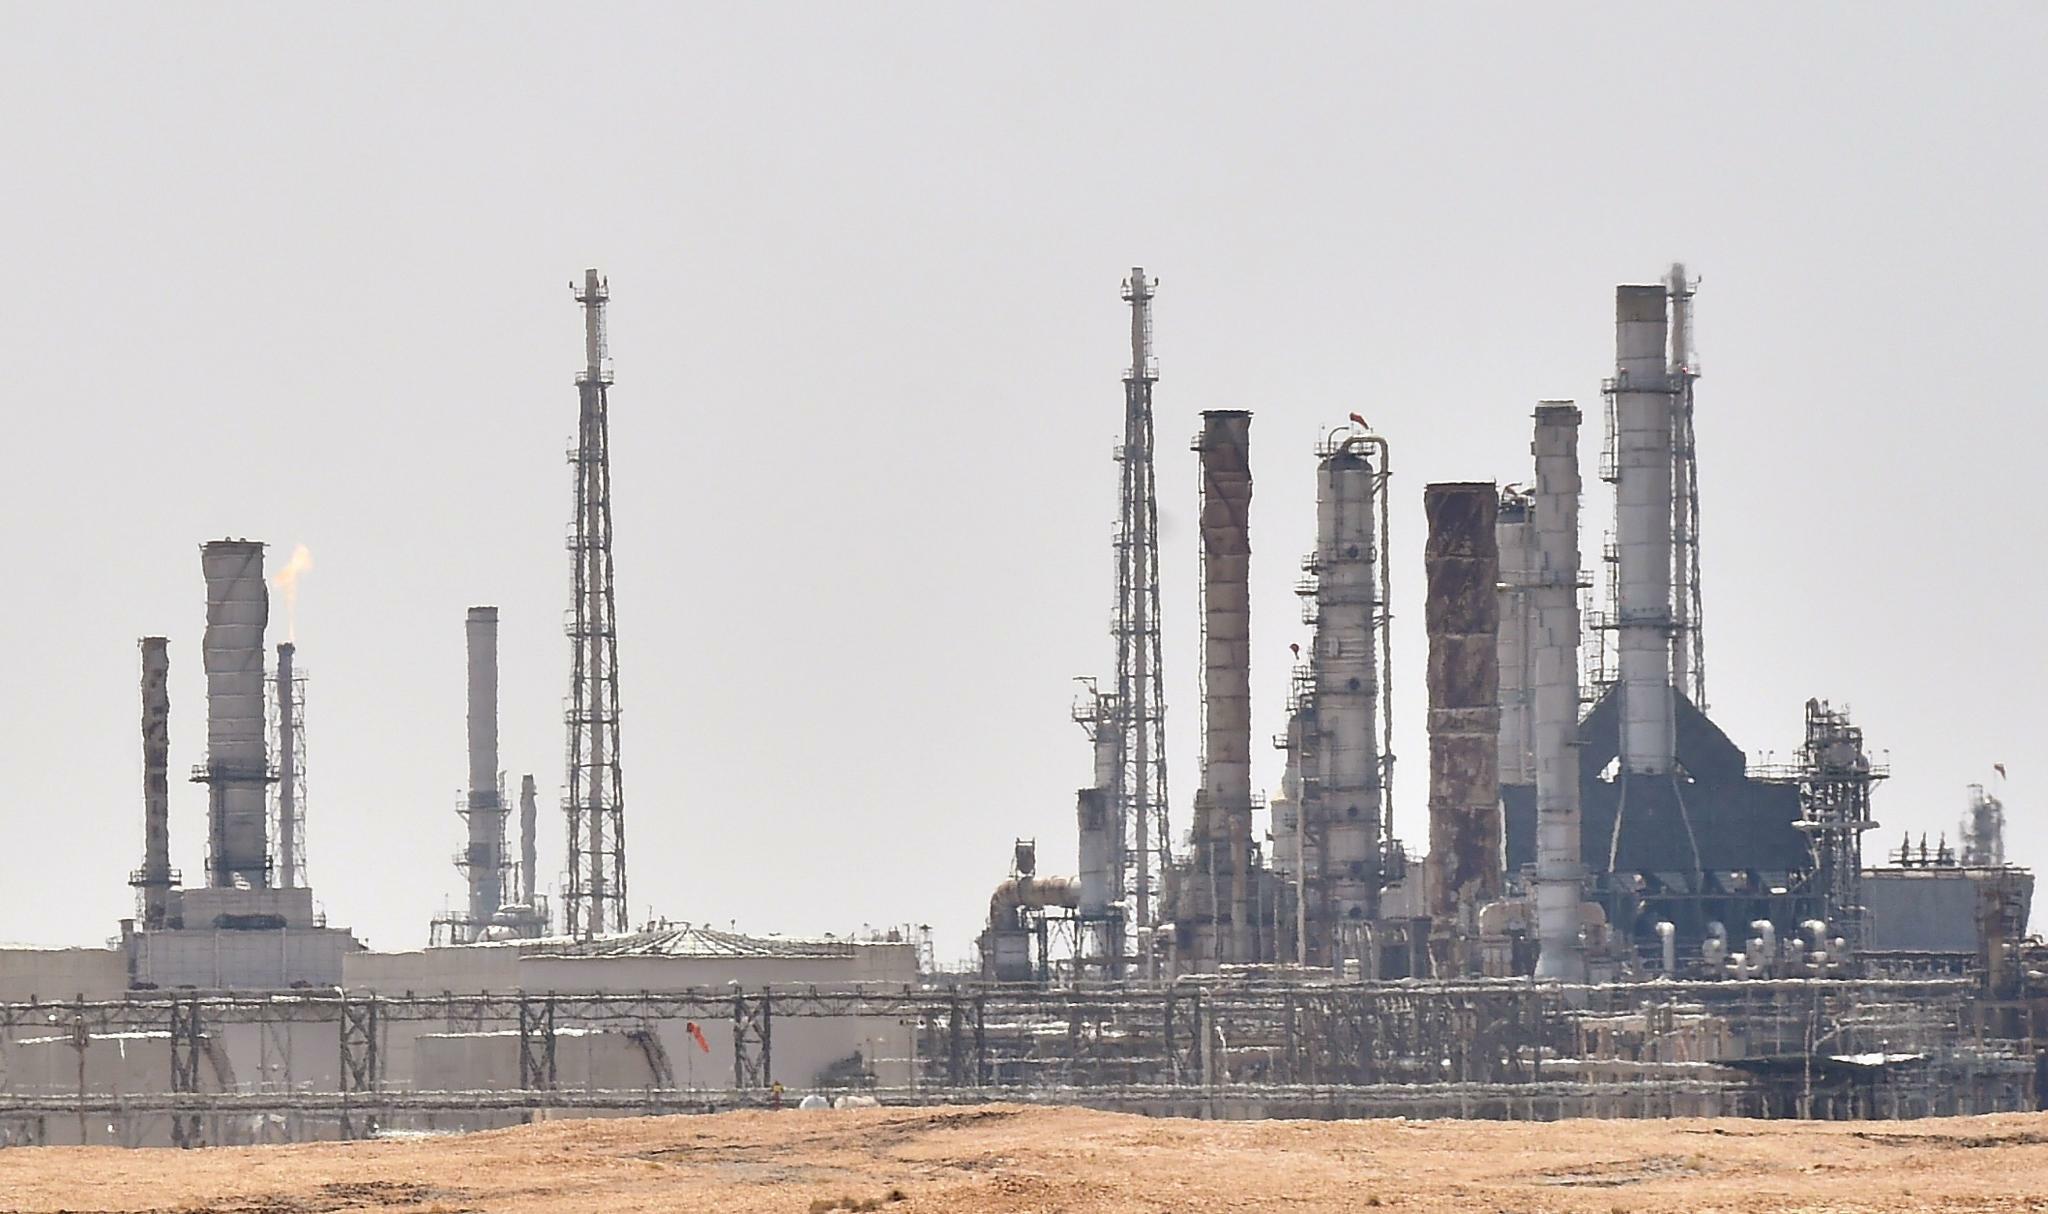 Angriff: Die Ölproduktion Saudi-Arabiens ist erheblich gestört